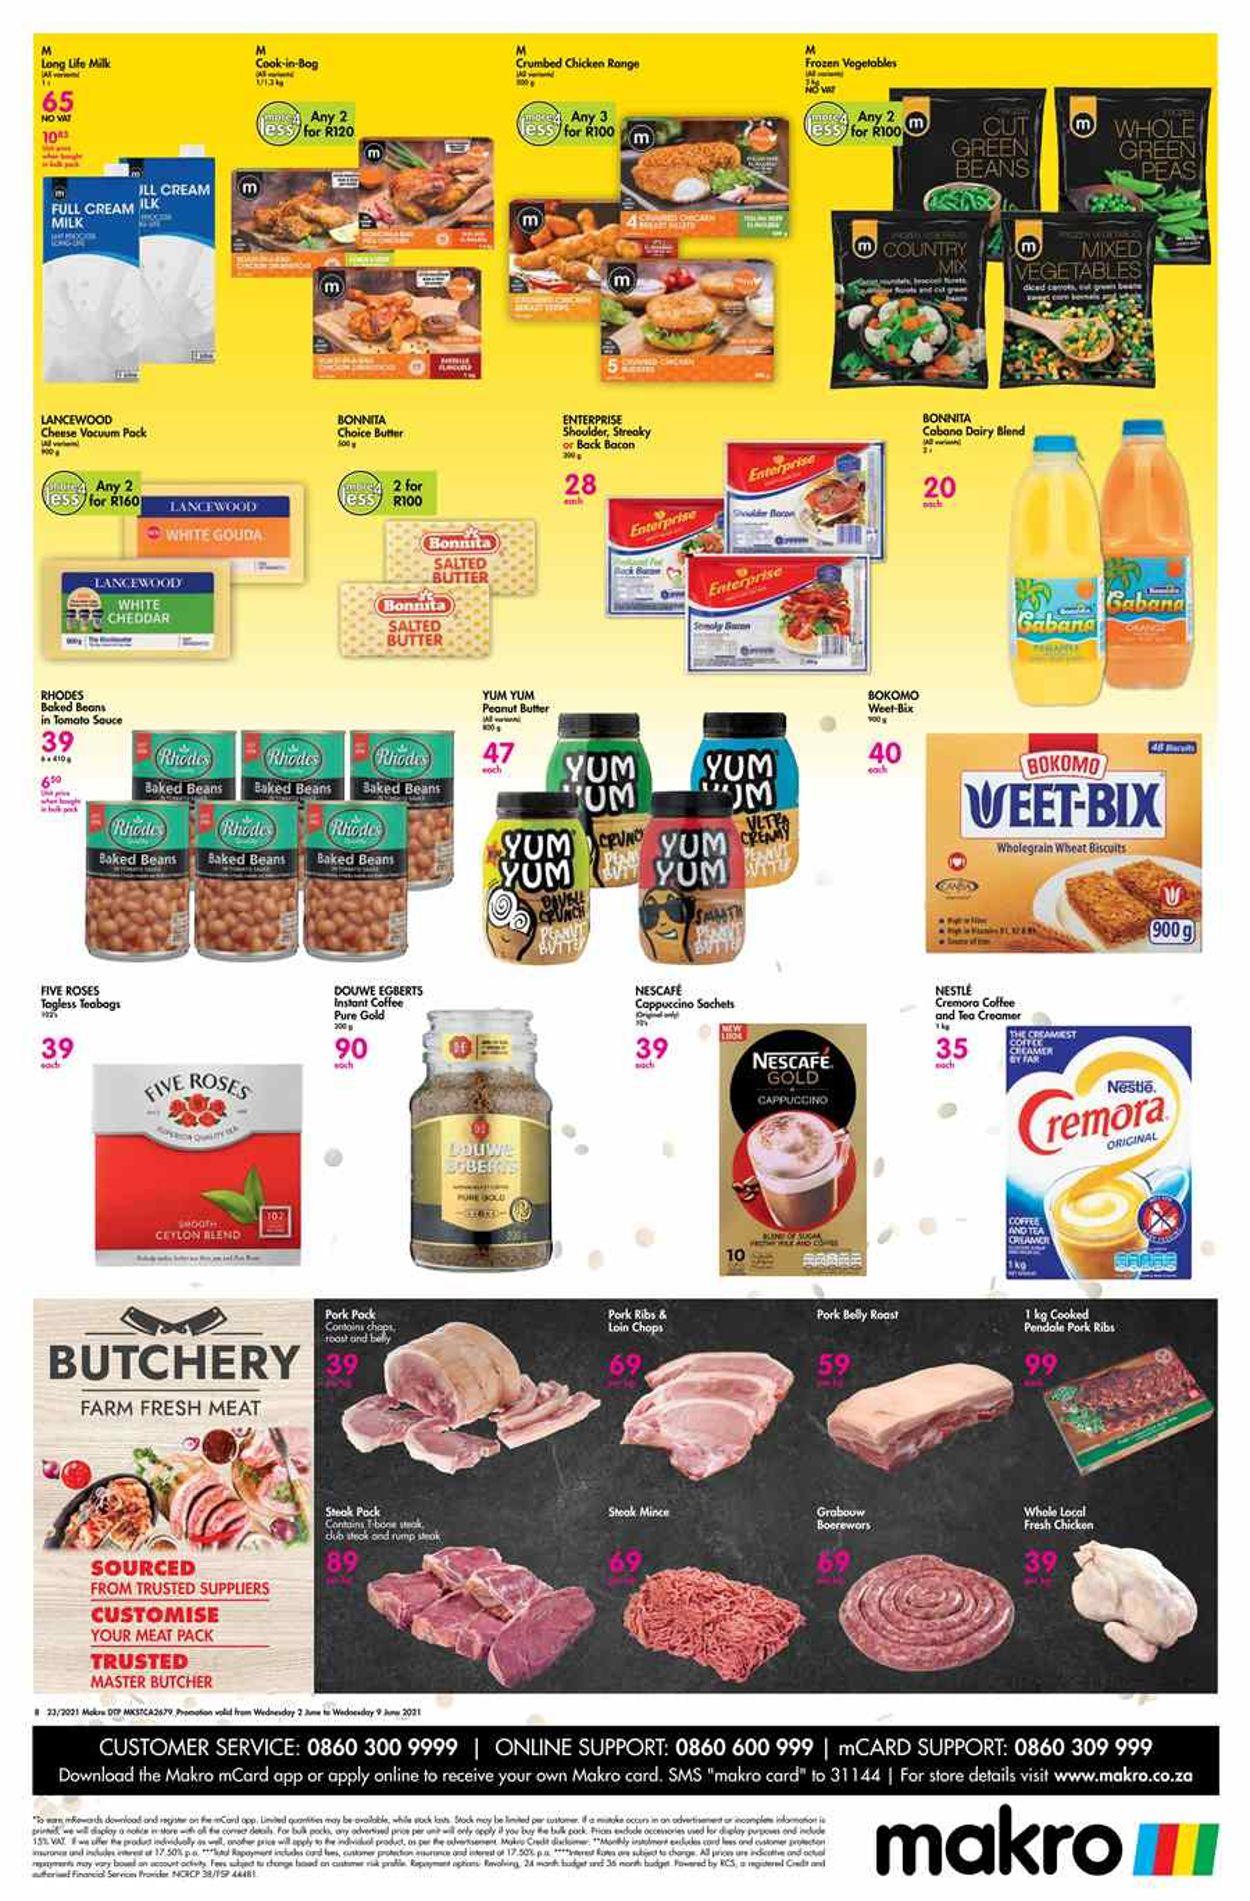 Makro Catalogue - 2021/05/26-2021/06/09 (Page 8)